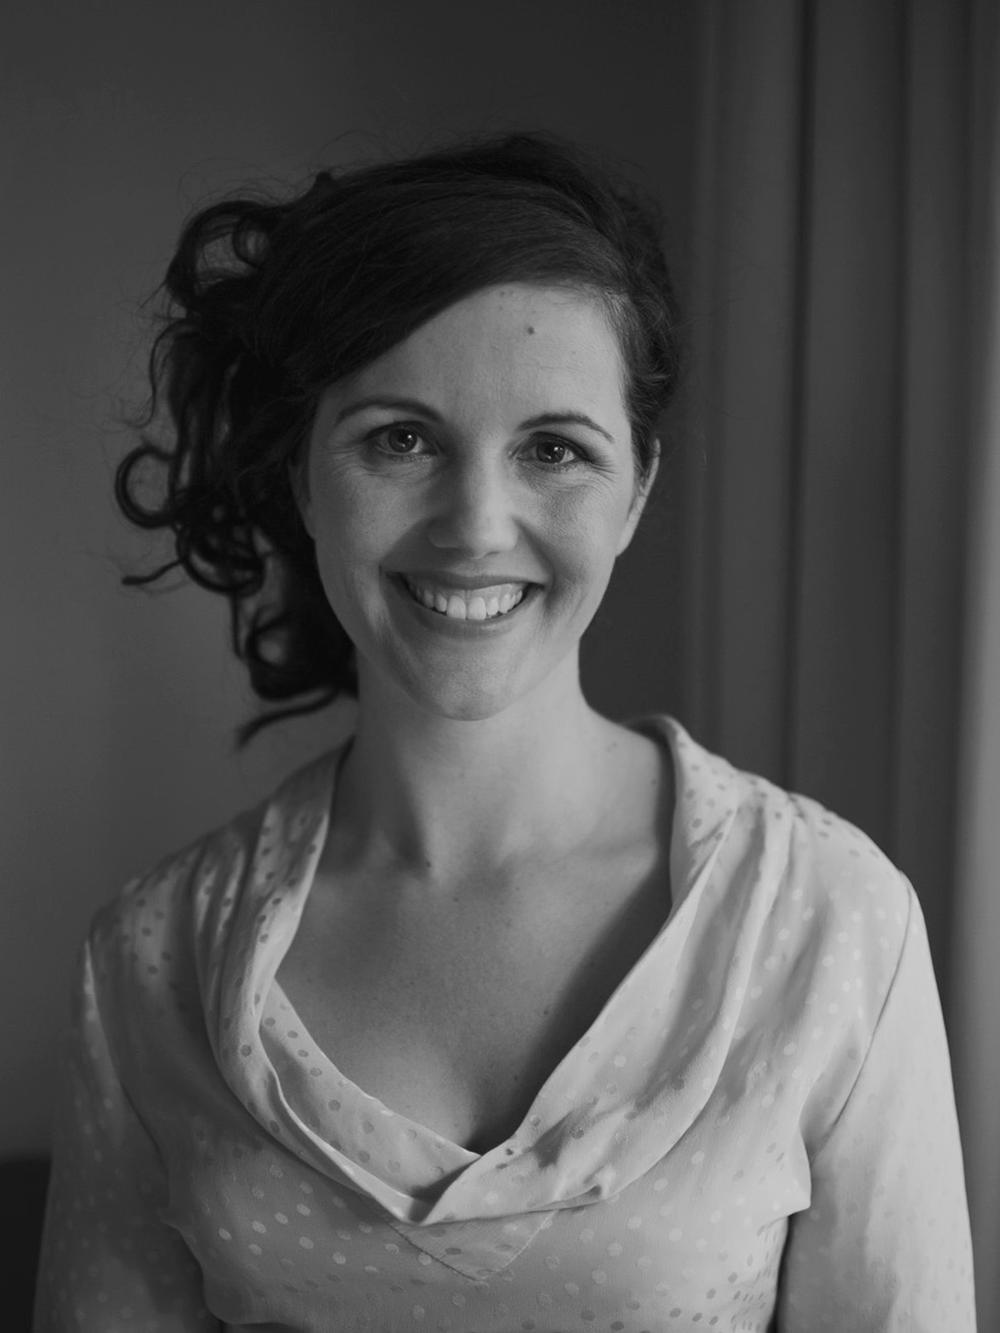 Megan Norgate